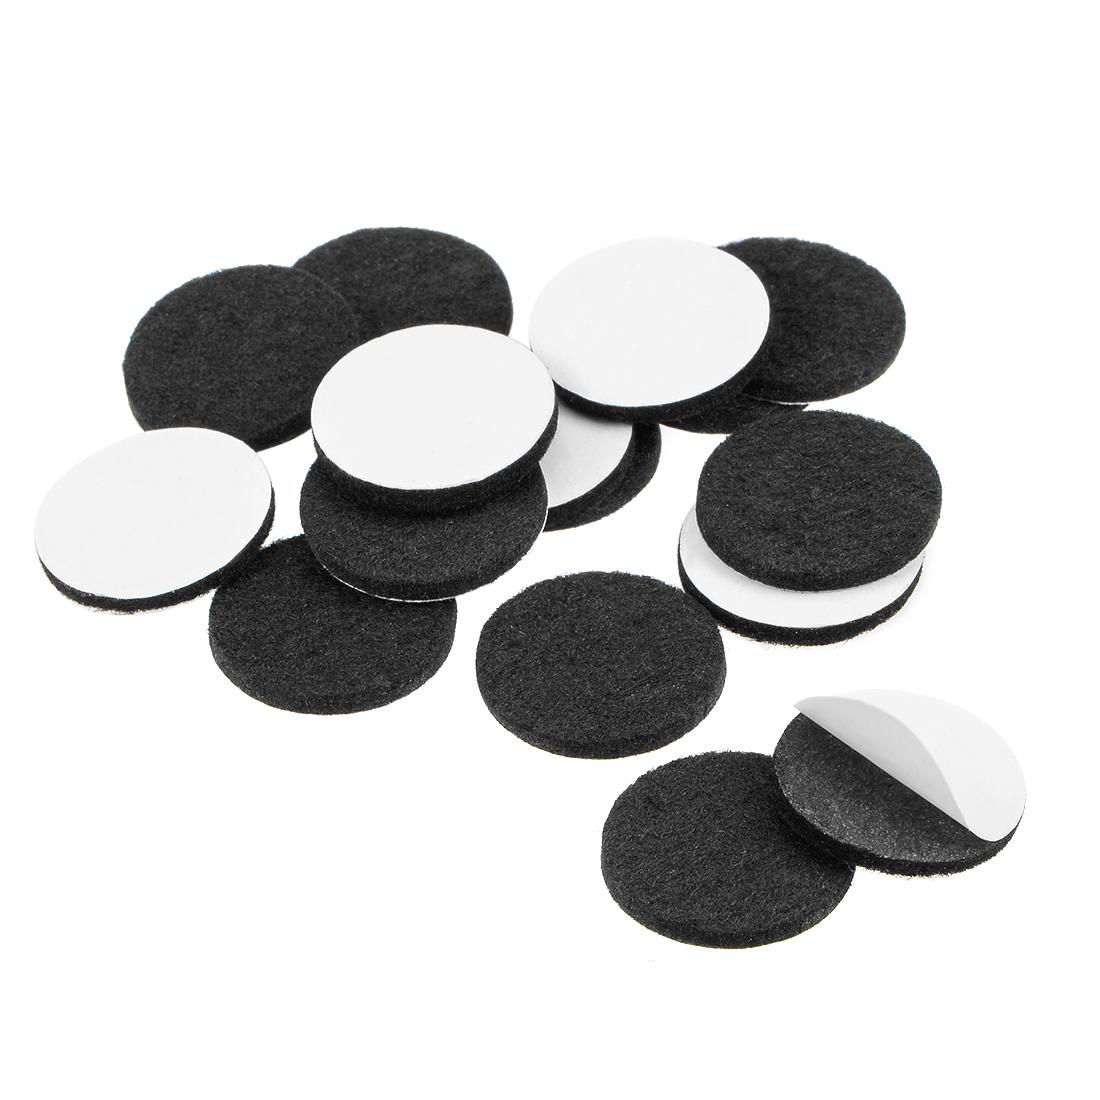 Furniture Pads Adhesive Felt Pads 25mm Diameter 3mm Thick Round Black 48Pcs